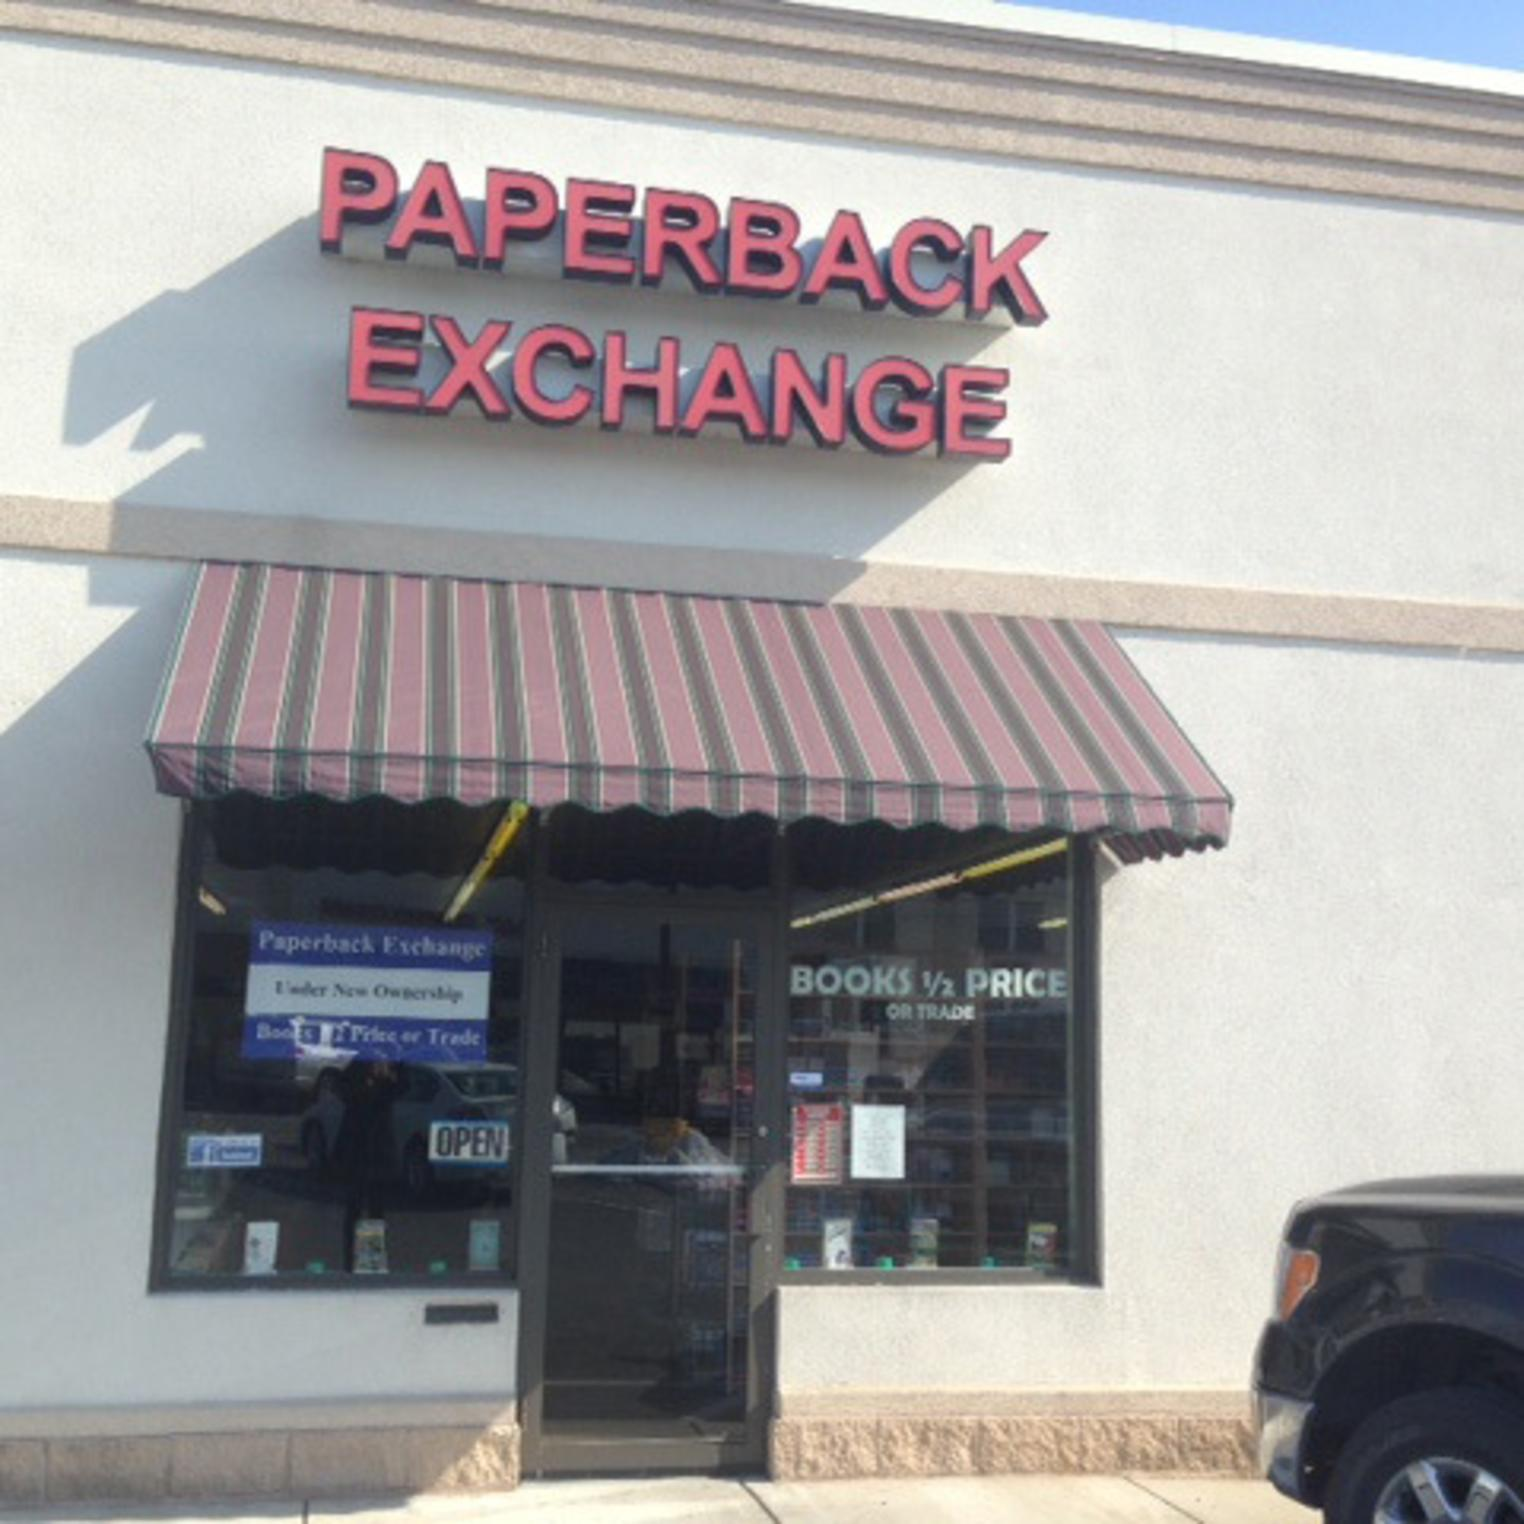 Paperback Exchange